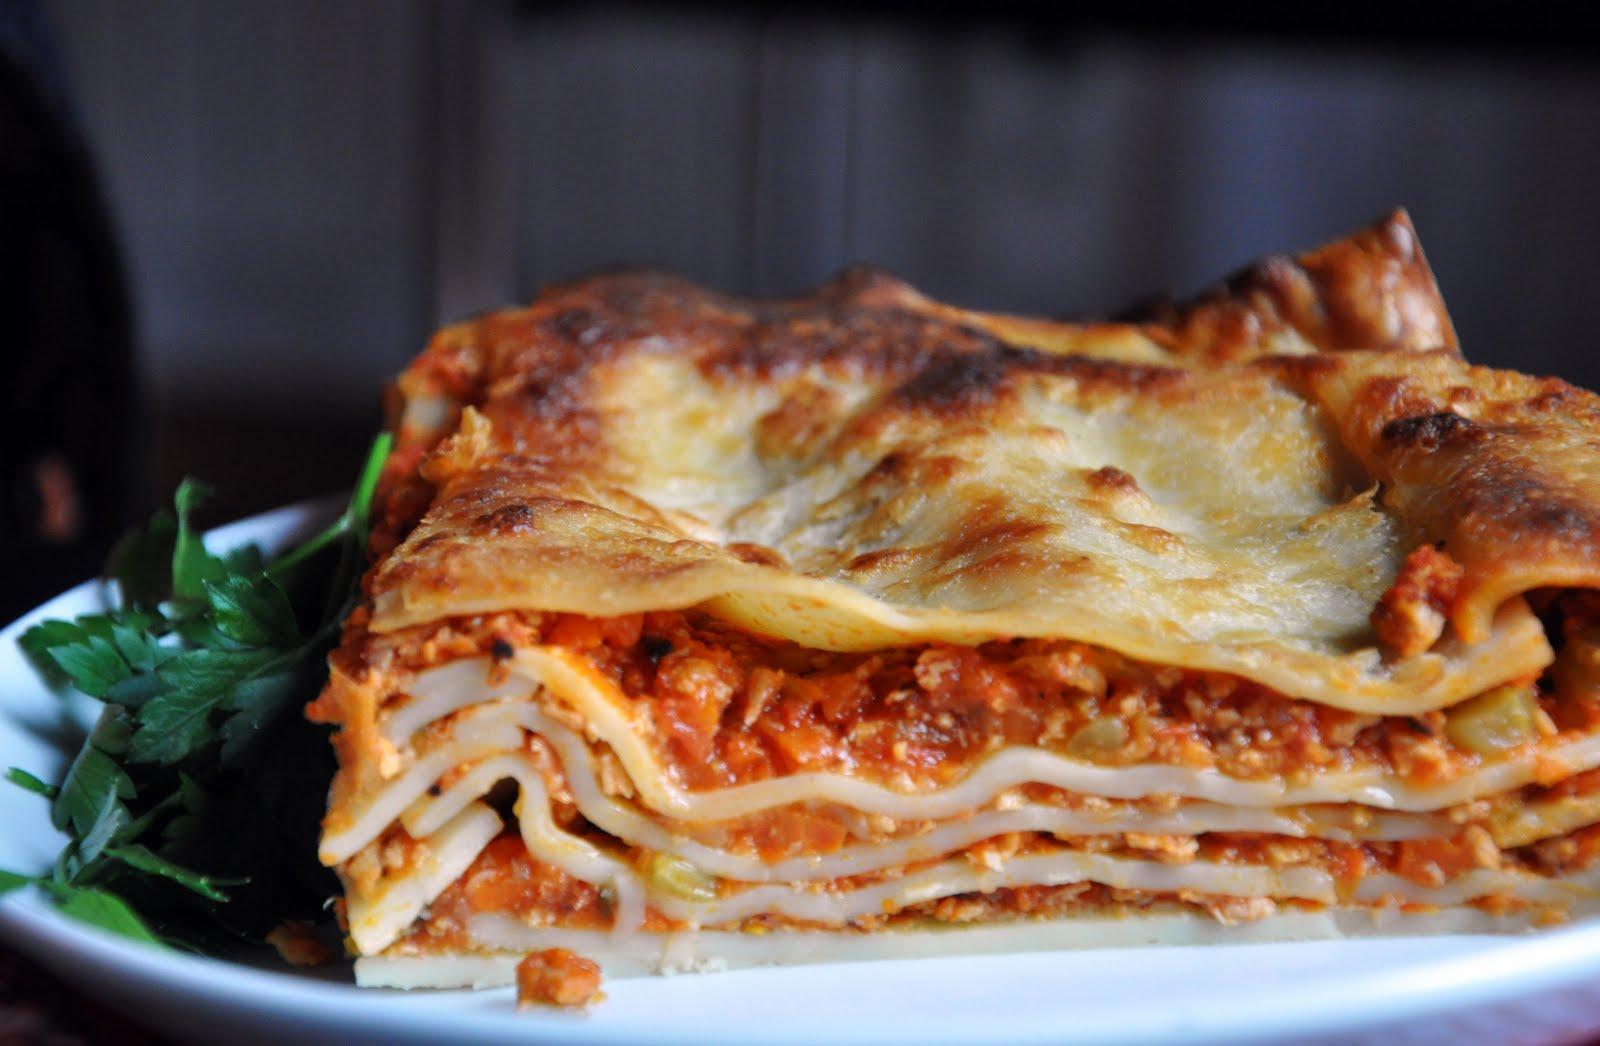 The Mediterranean Vegan: Lasagne alla Bolognese